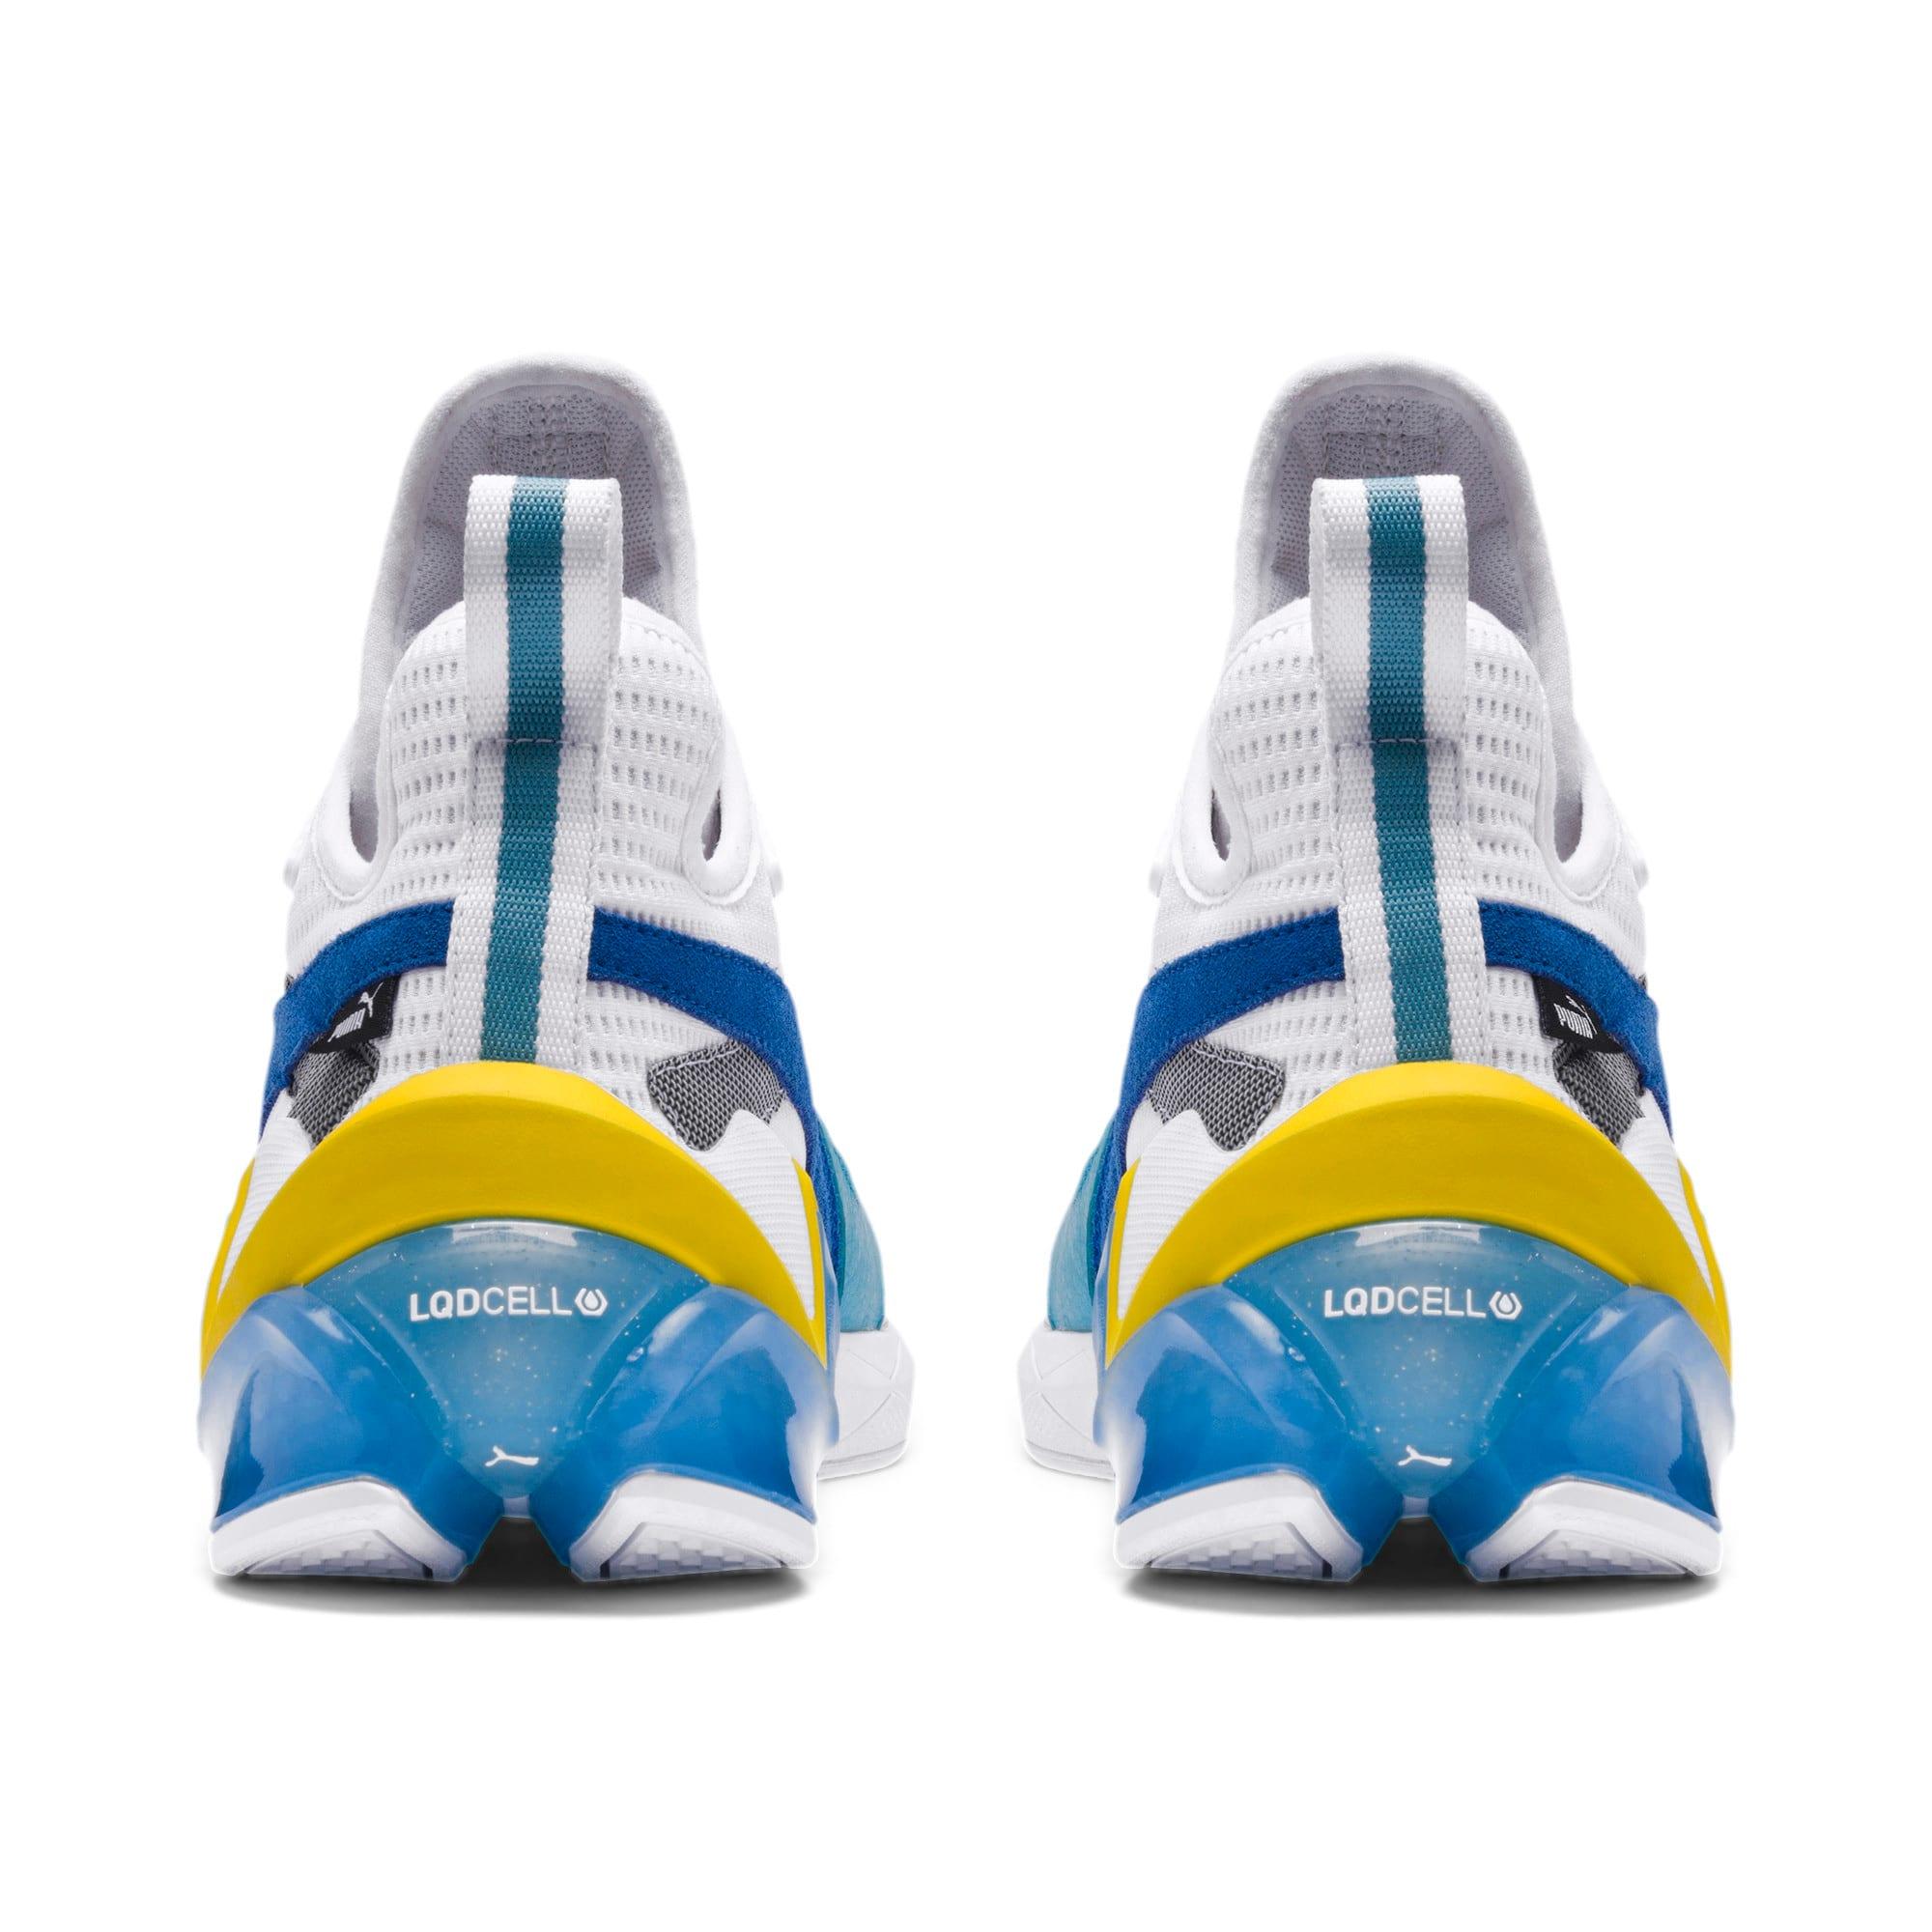 Thumbnail 3 of LQDCELL Origin Men's Shoes, Puma White-B Blue-Blz Yellow, medium